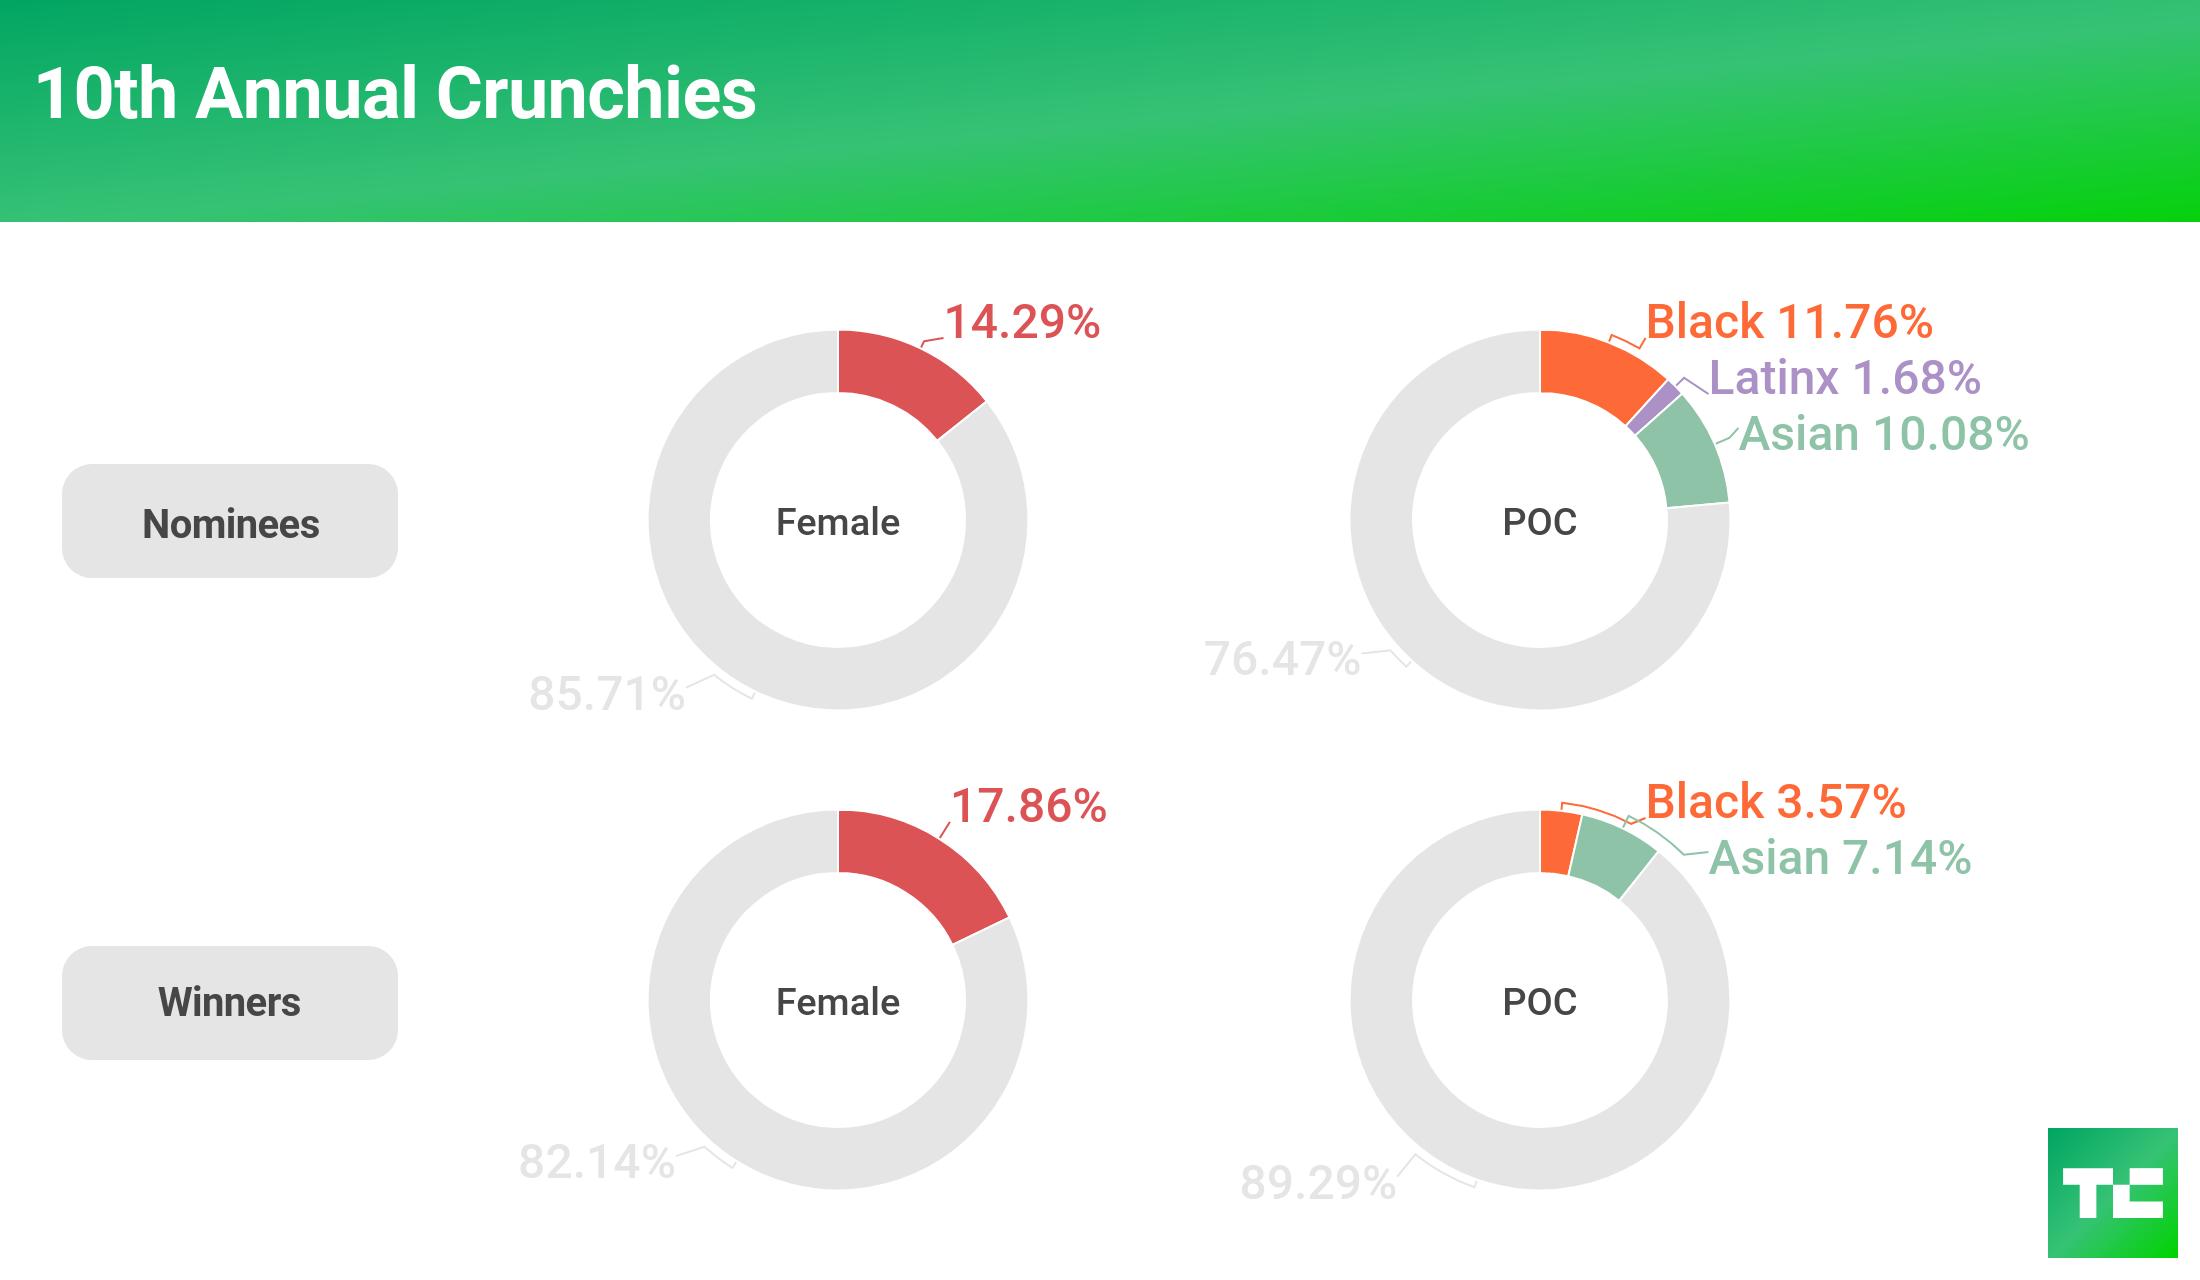 tc diversity 2018 crunchies february 2017